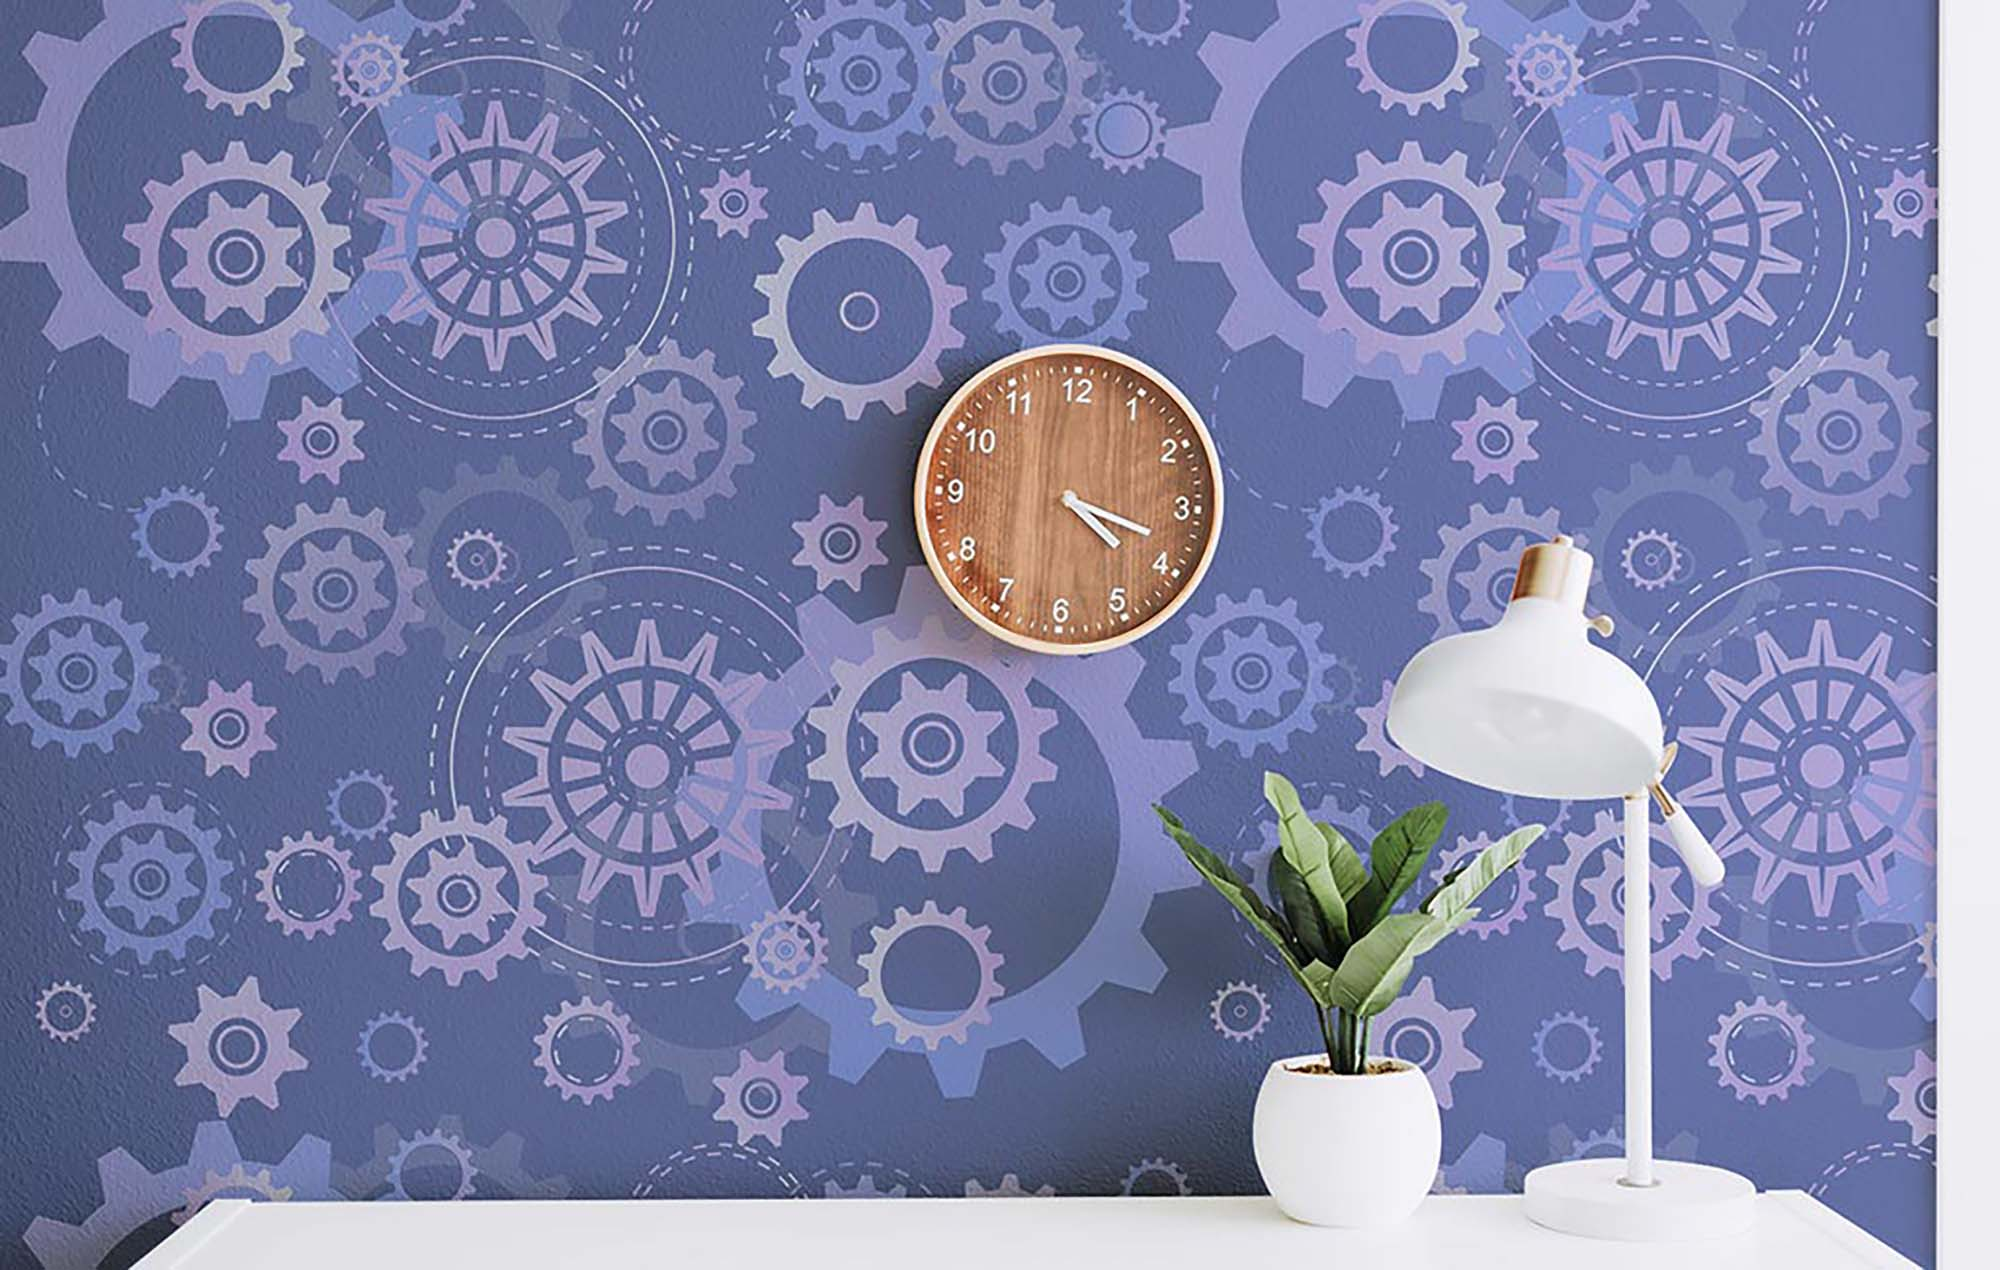 Wallpaper Mockup